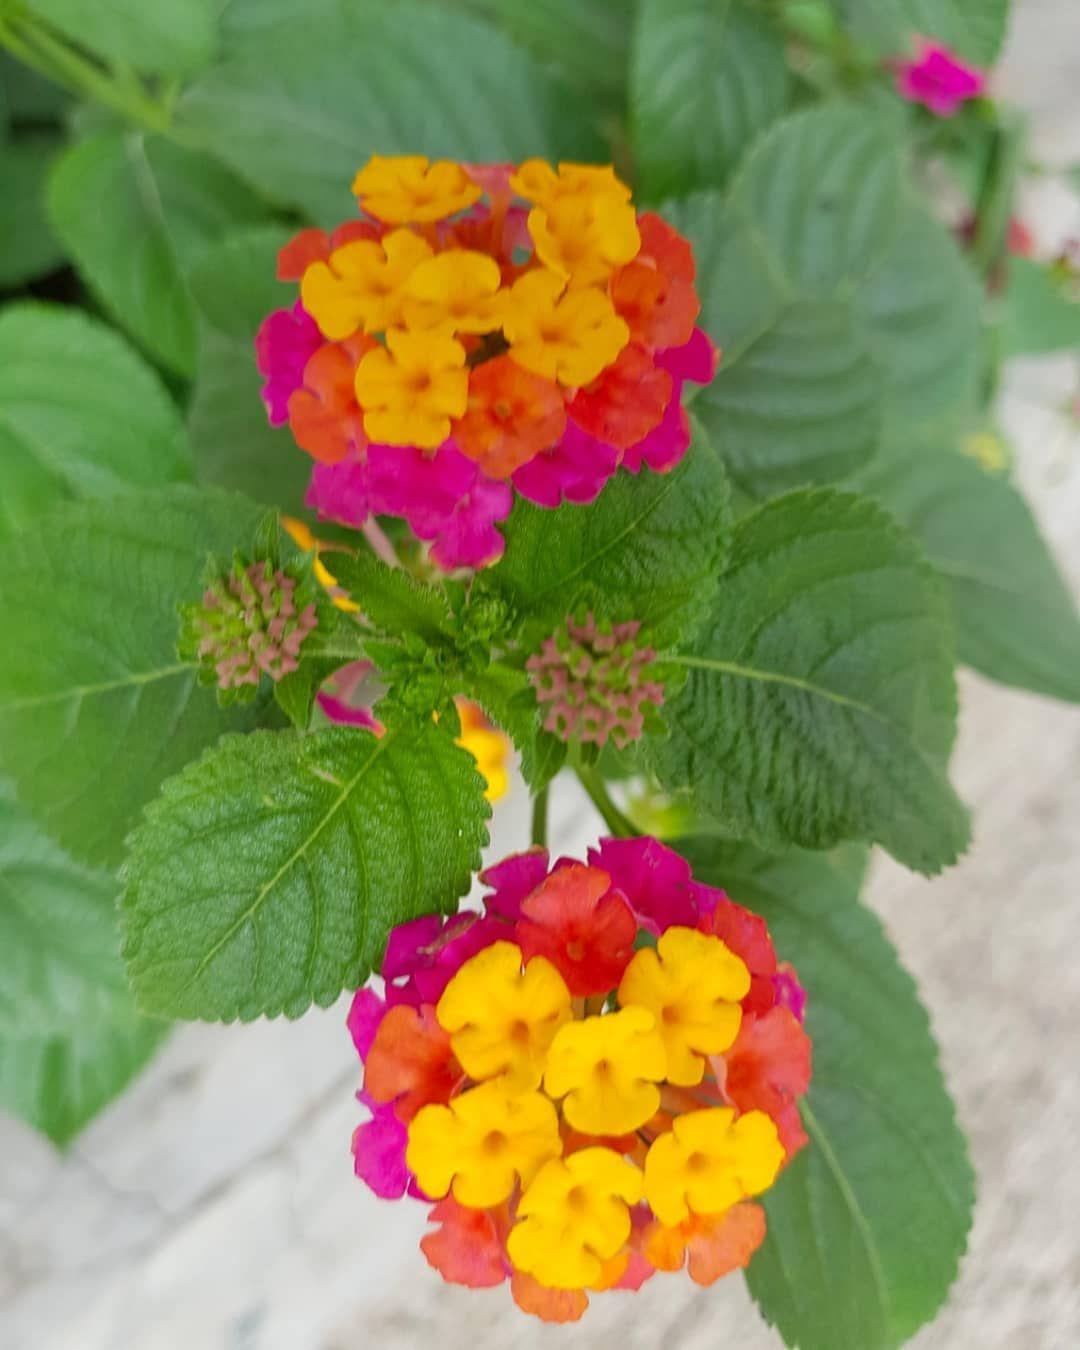 I Captured This Colorful Lantana Flower On The Side Road Garden Floweringplant Flowergarden Flowers Lantana Lantana Flower Flowers Name List Flower Names